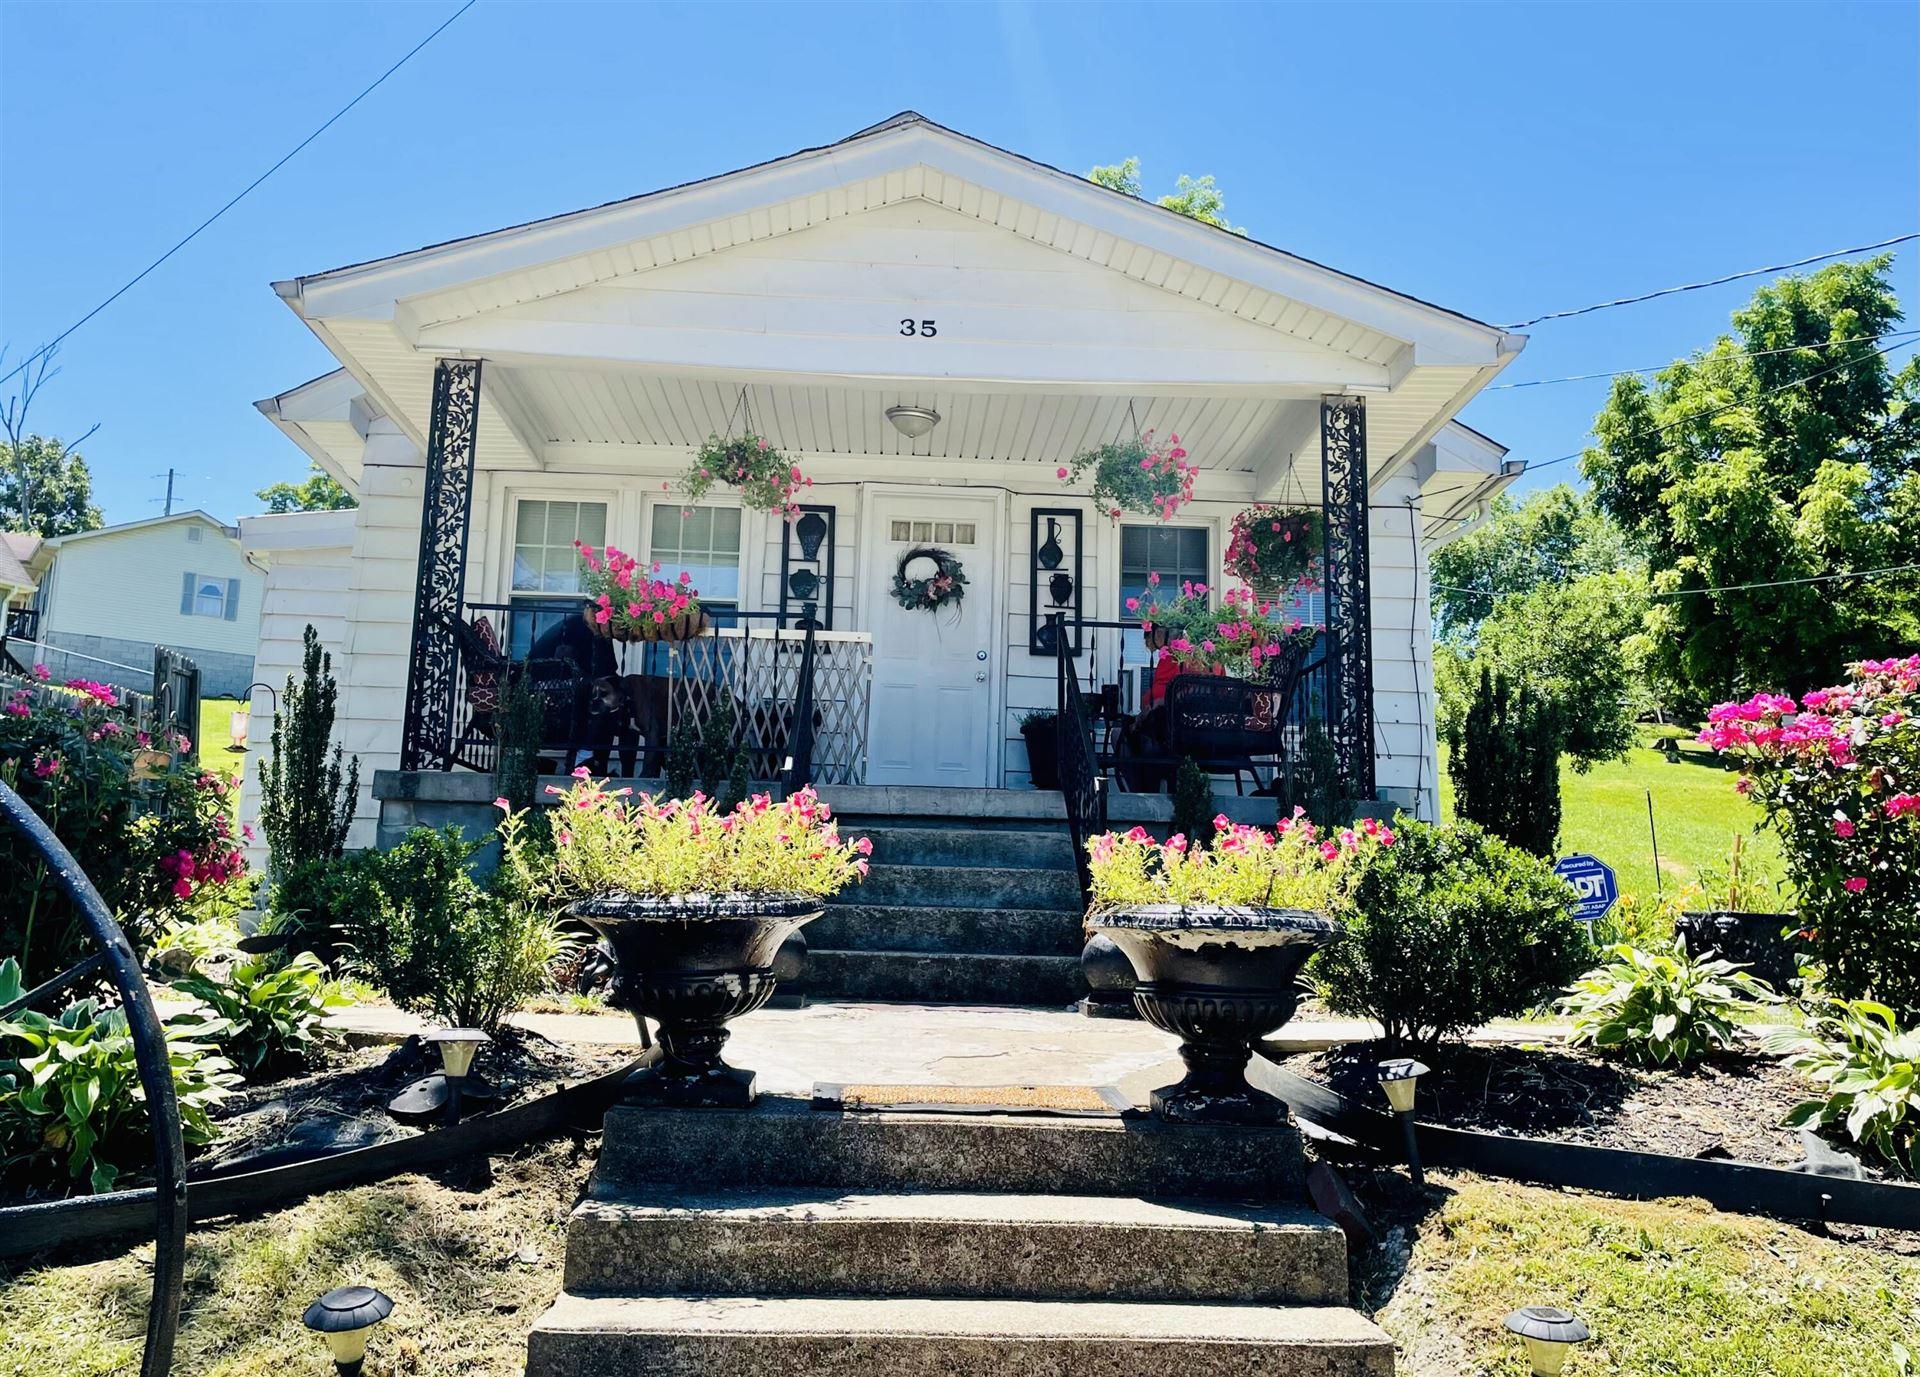 35 Davis, Mount Vernon, KY 40456 - MLS#: 20112207